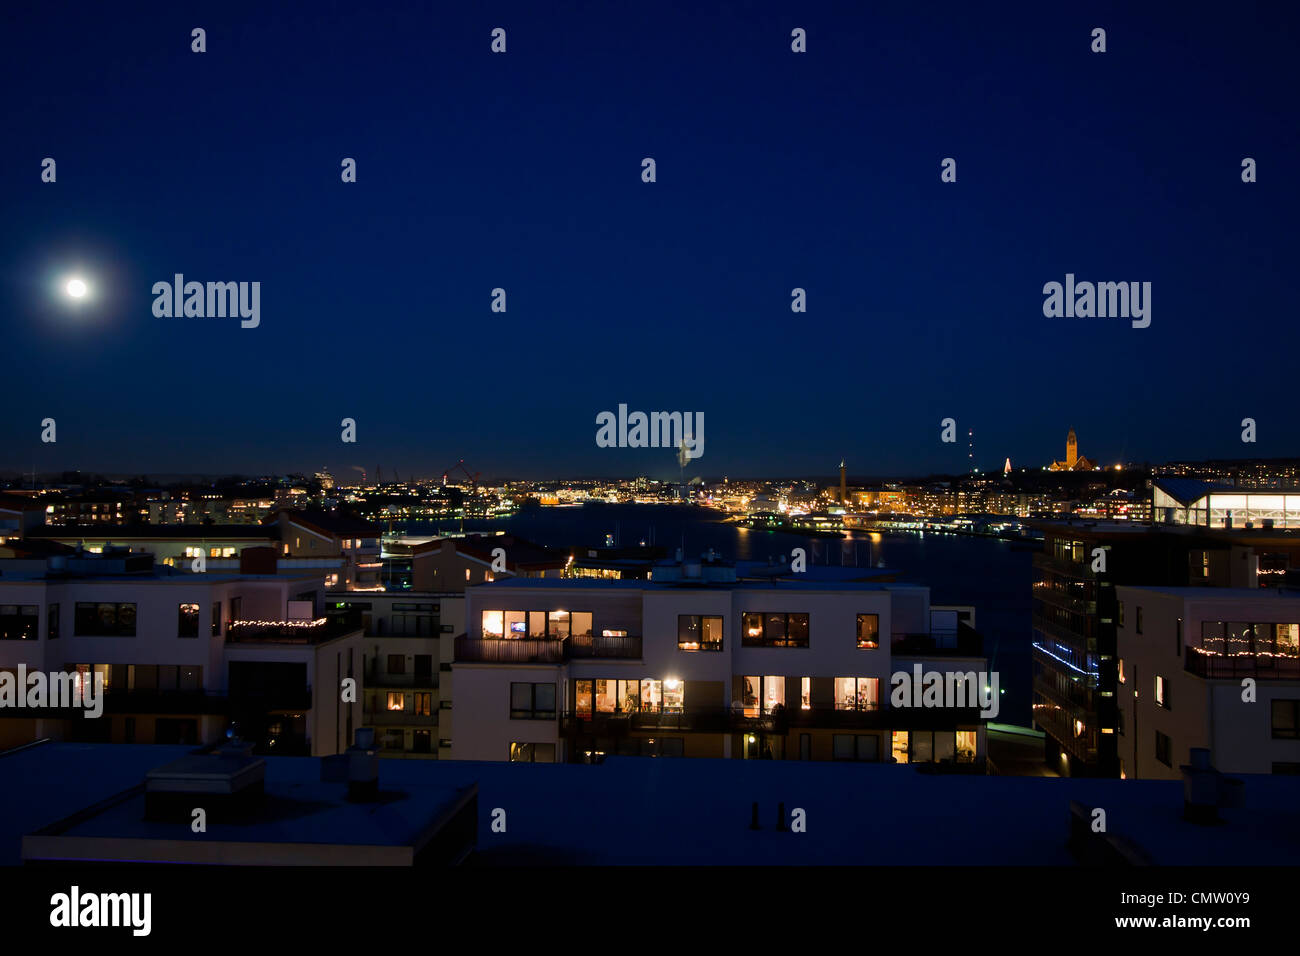 Illuminated view of cityscape at night - Stock Image